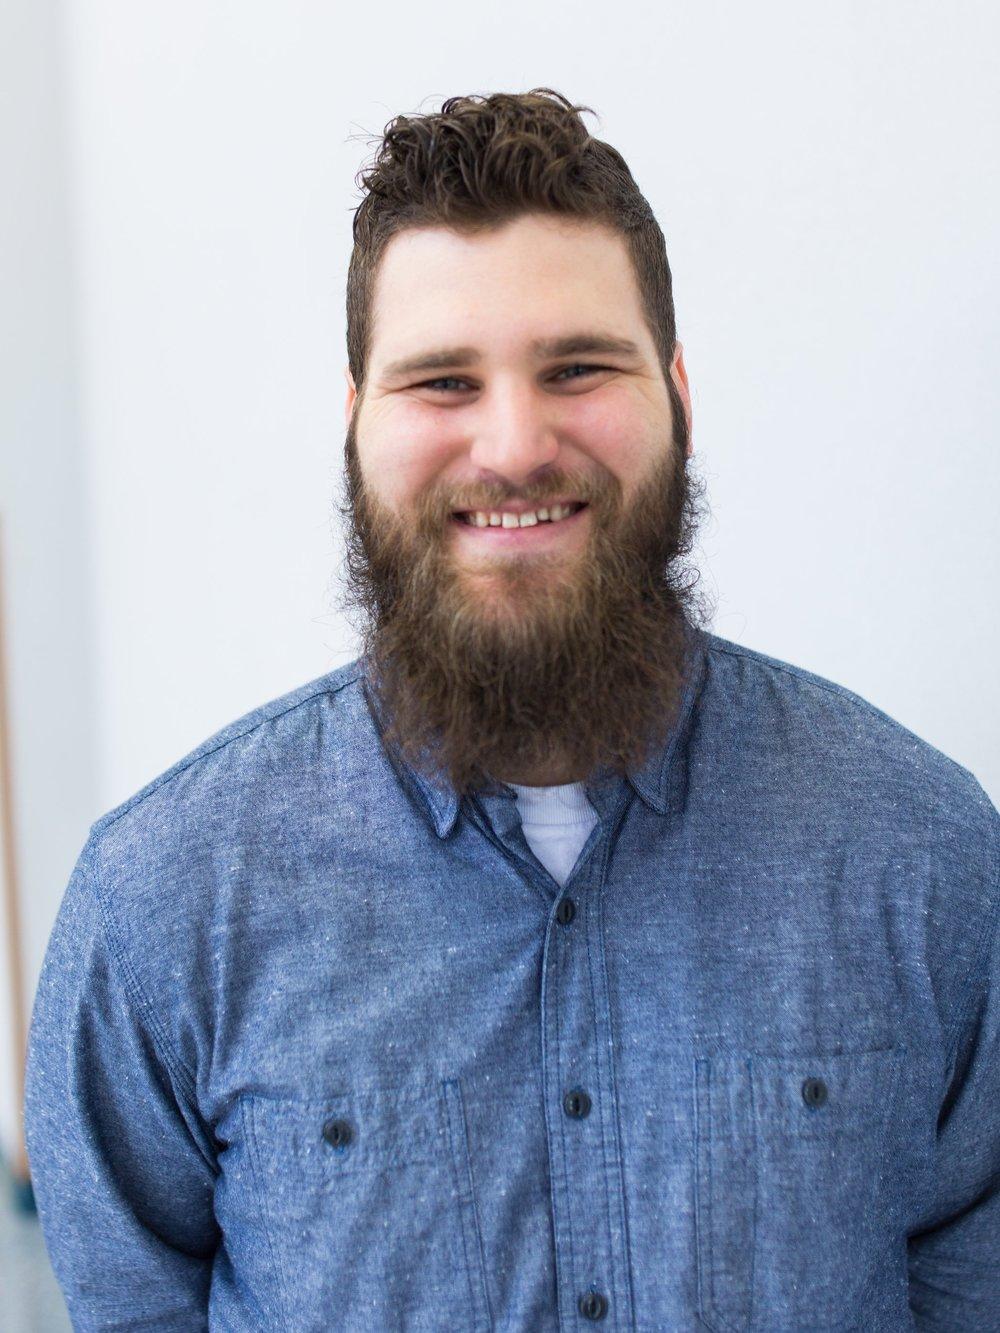 Aaron Cotton - Family Discipleship Pastor